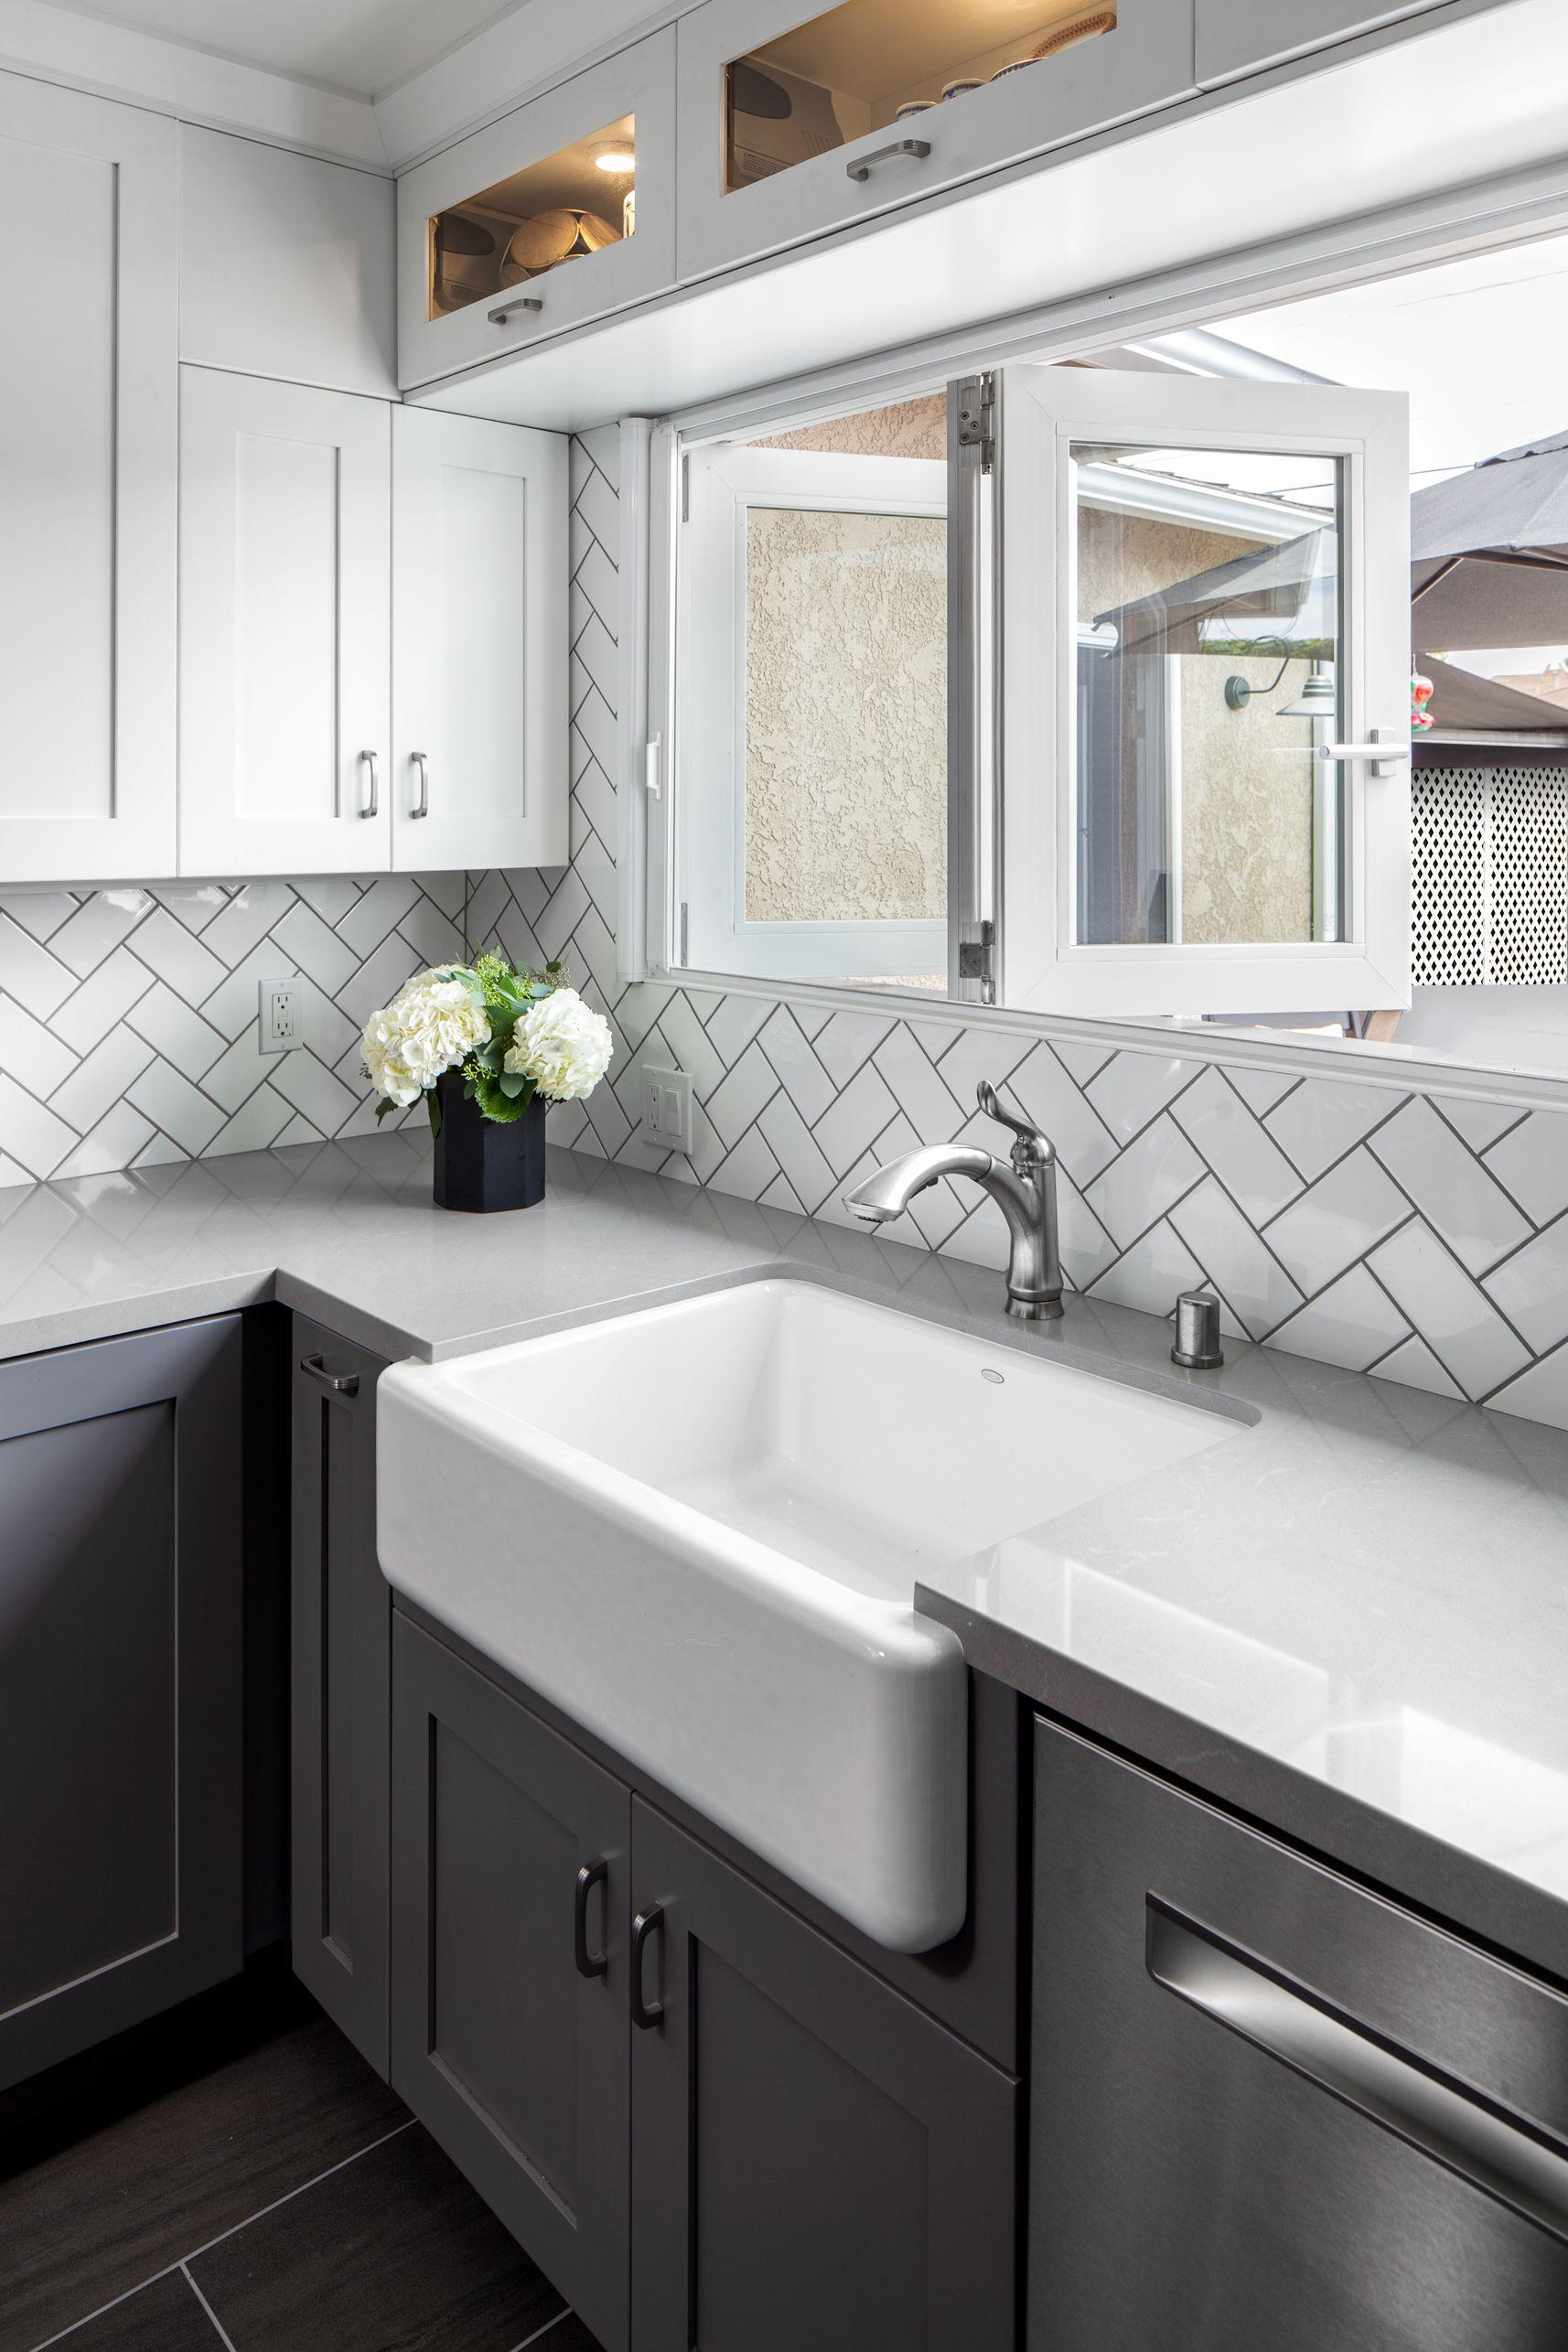 - Remodeled Kitchen Complete With White Subway Tile Backsplash In